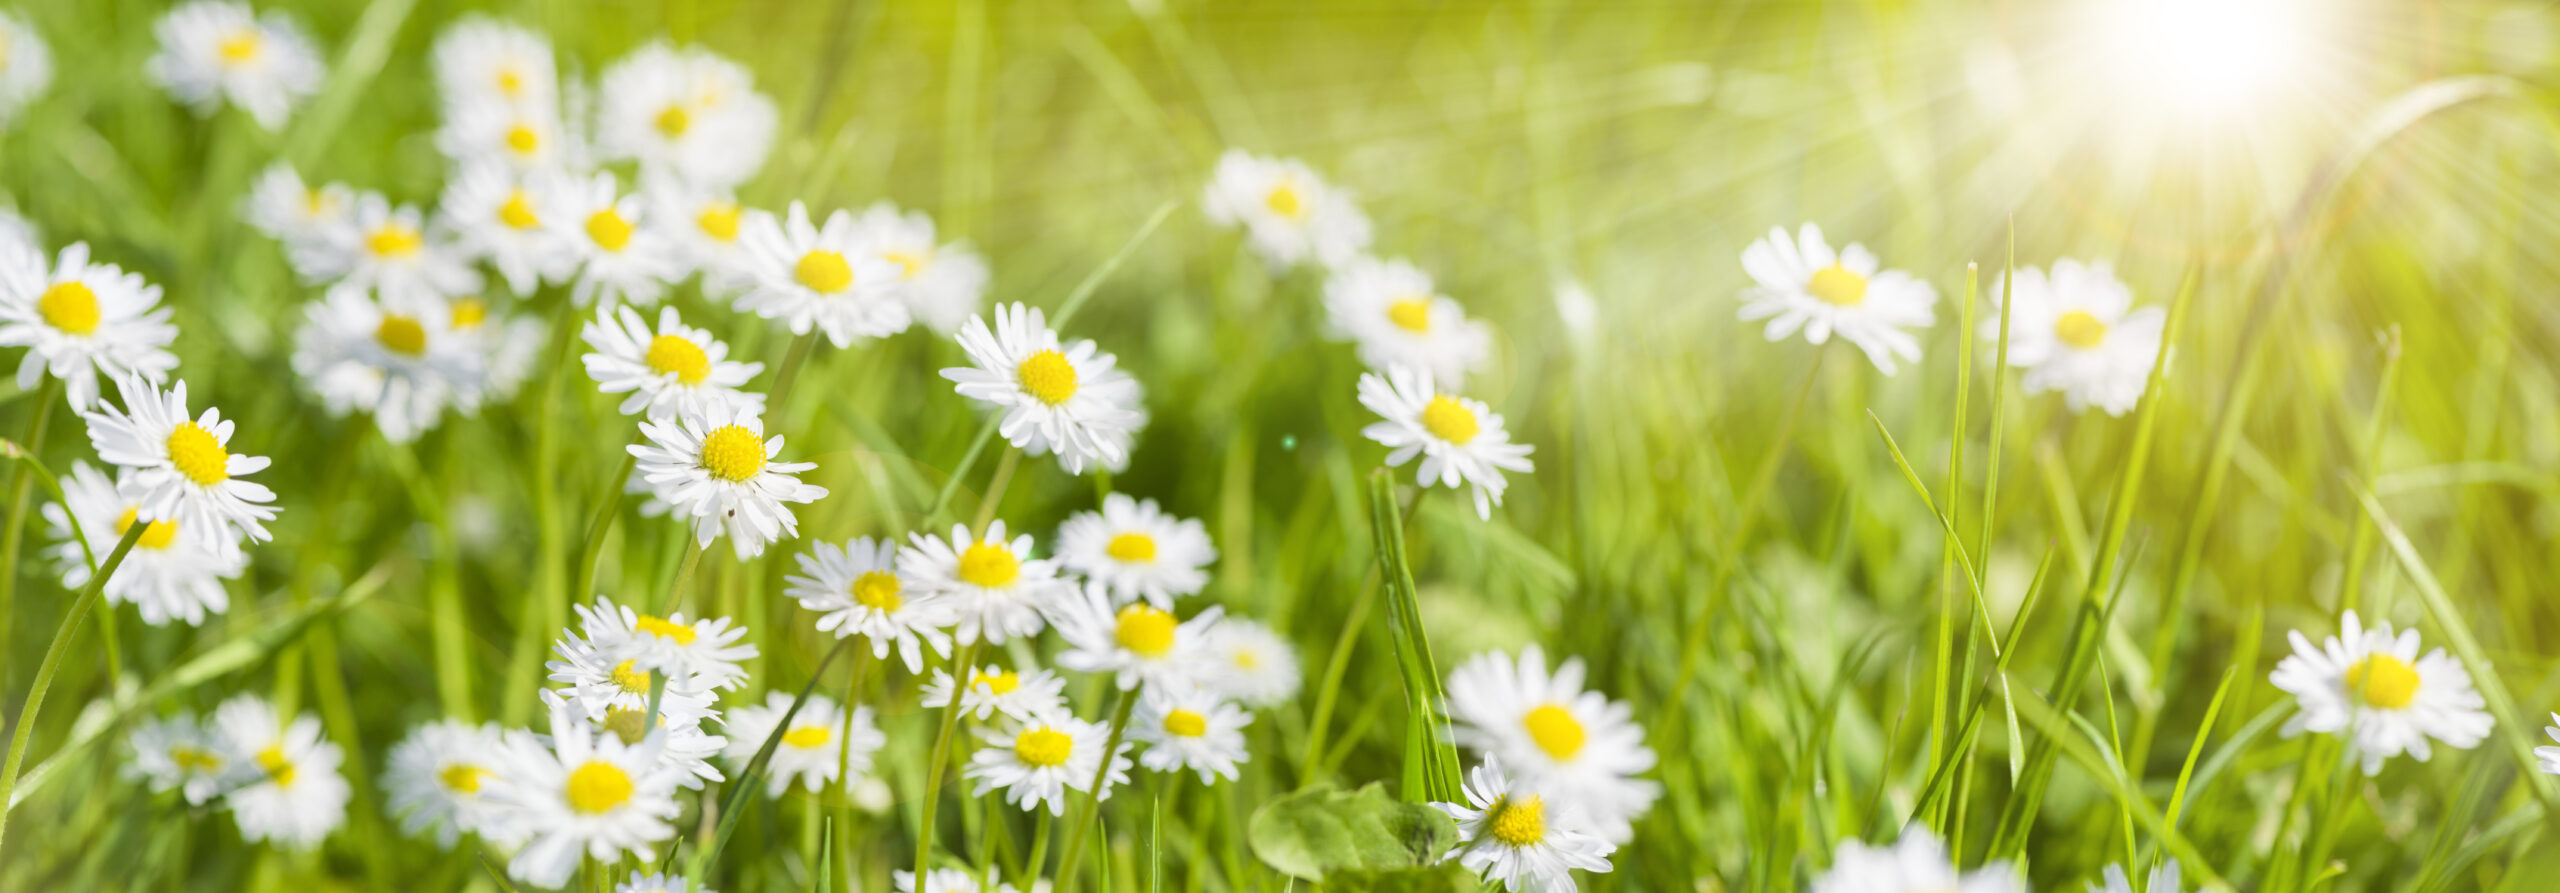 Blomma,blommor,gräs,grön,vit, sommar